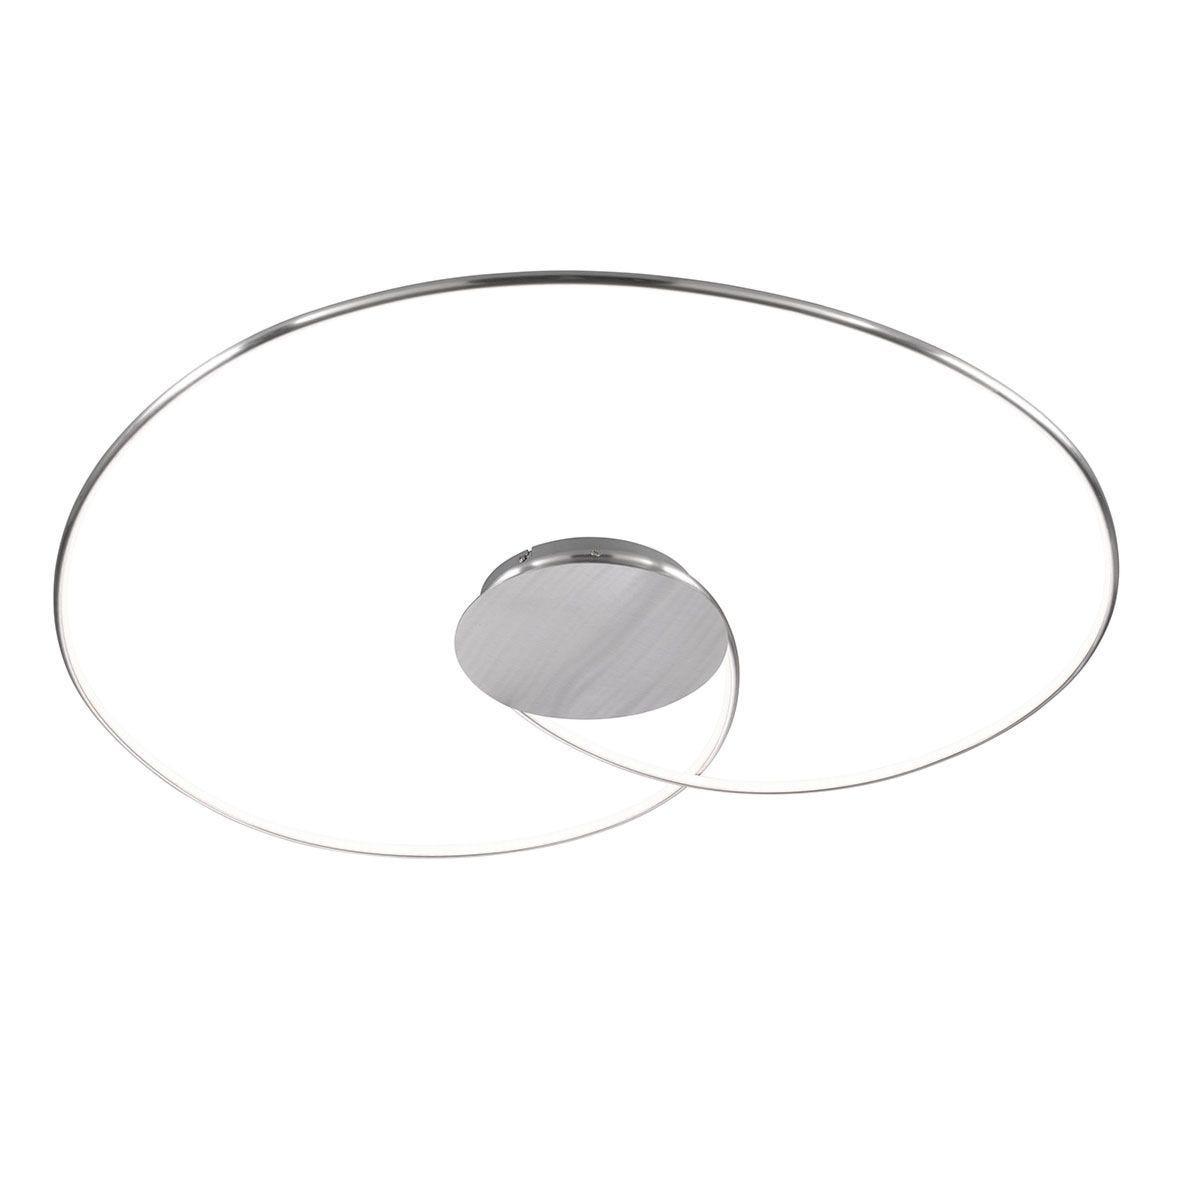 Wofi Opus Brushed Aluminium  Ceiling Lamp - 1x LED (32W 3200 Lumen)